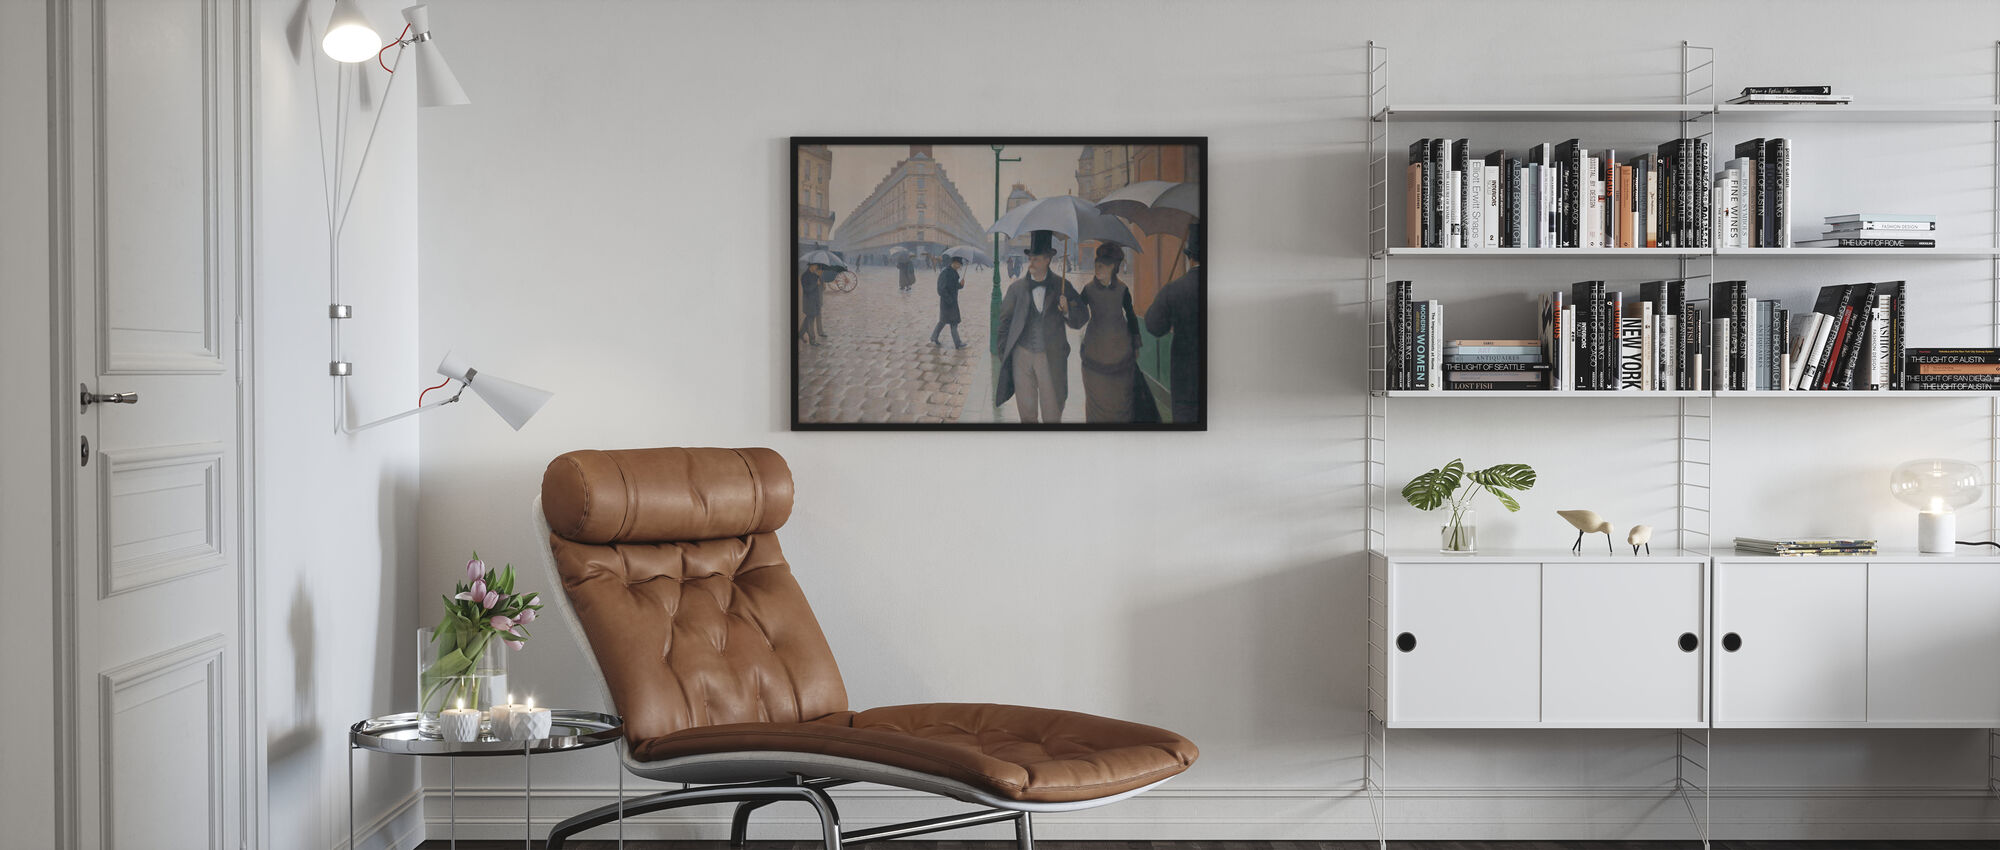 Paris Street - Gustave Caillebotte - Poster - Vardagsrum